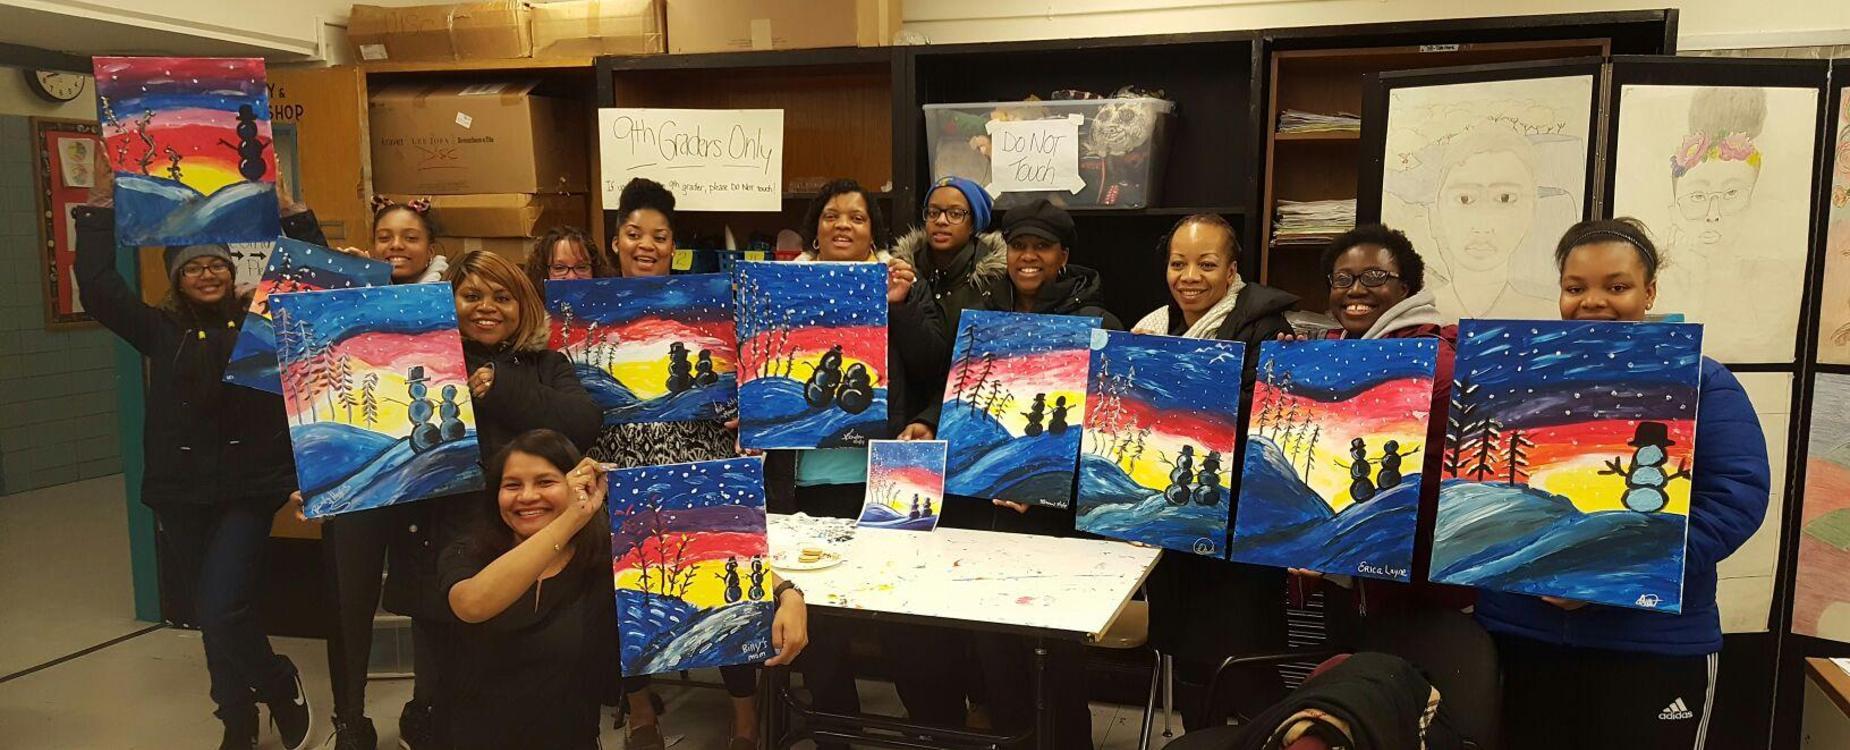 Yeca families enjoying family paint night